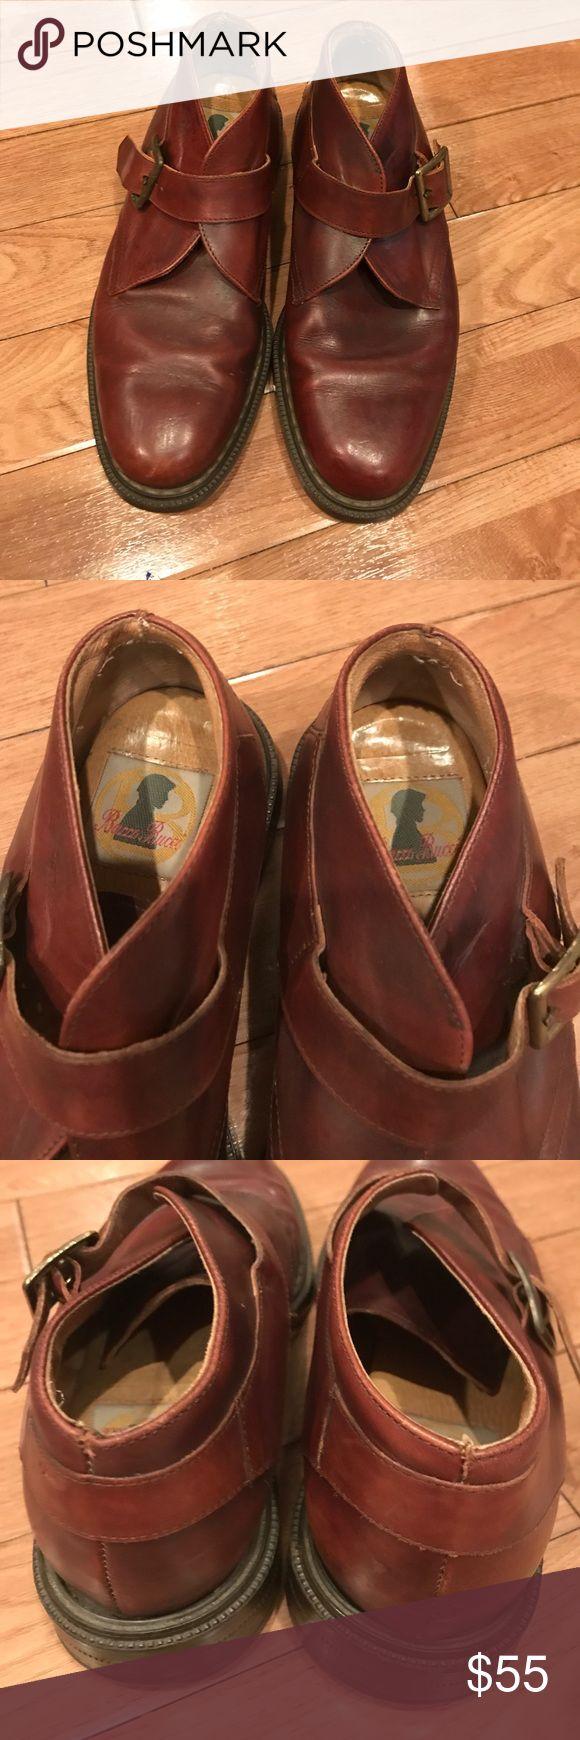 Bacco bucci shoes Sz 7 Leather brown shoes Bacco Bucci Shoes